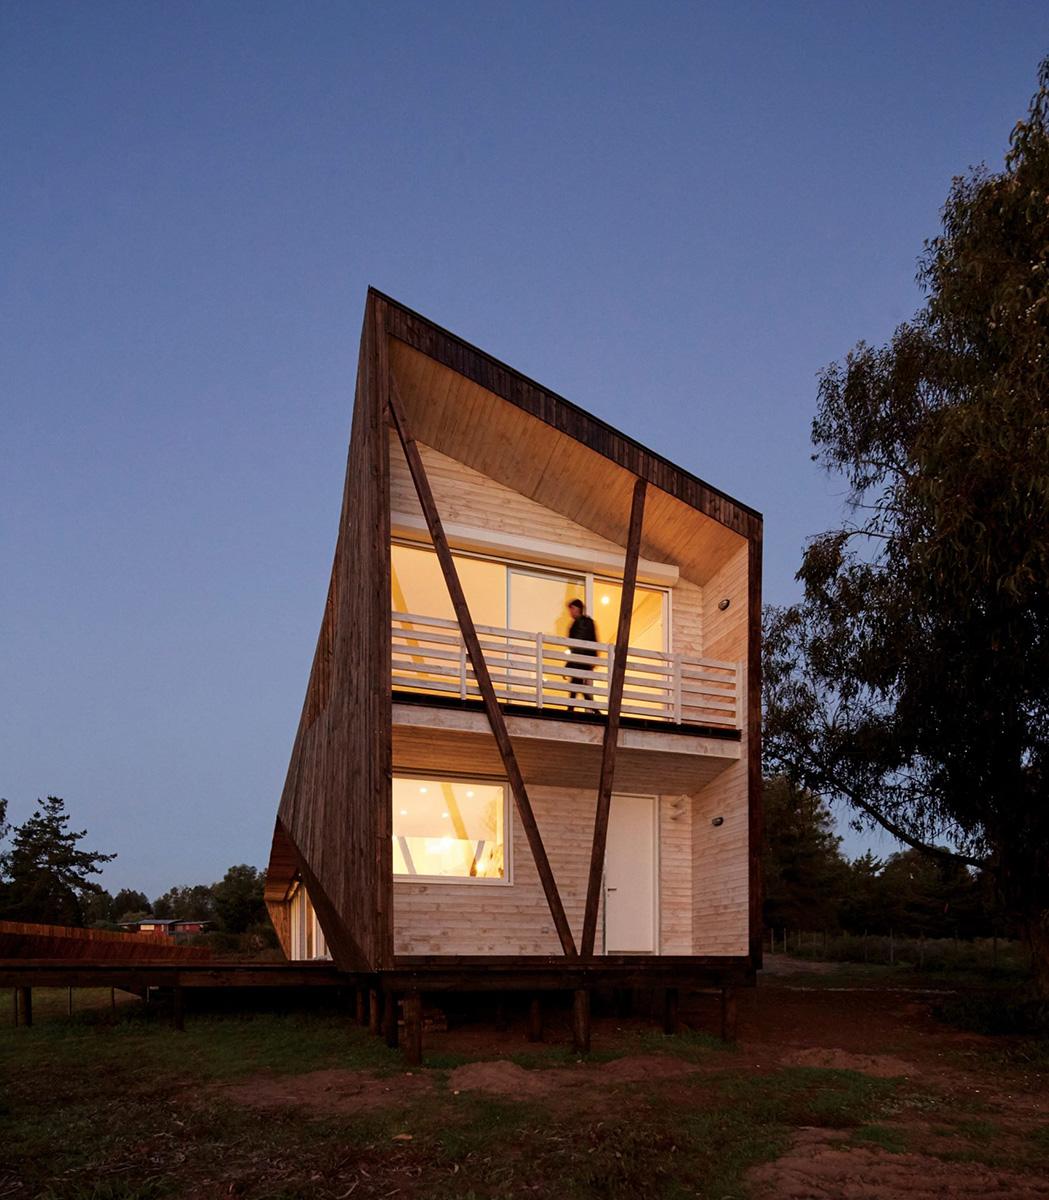 05-arquitectura-chilena-casa-dos-pieles-veronica-arcos-foto-cristobal-palma